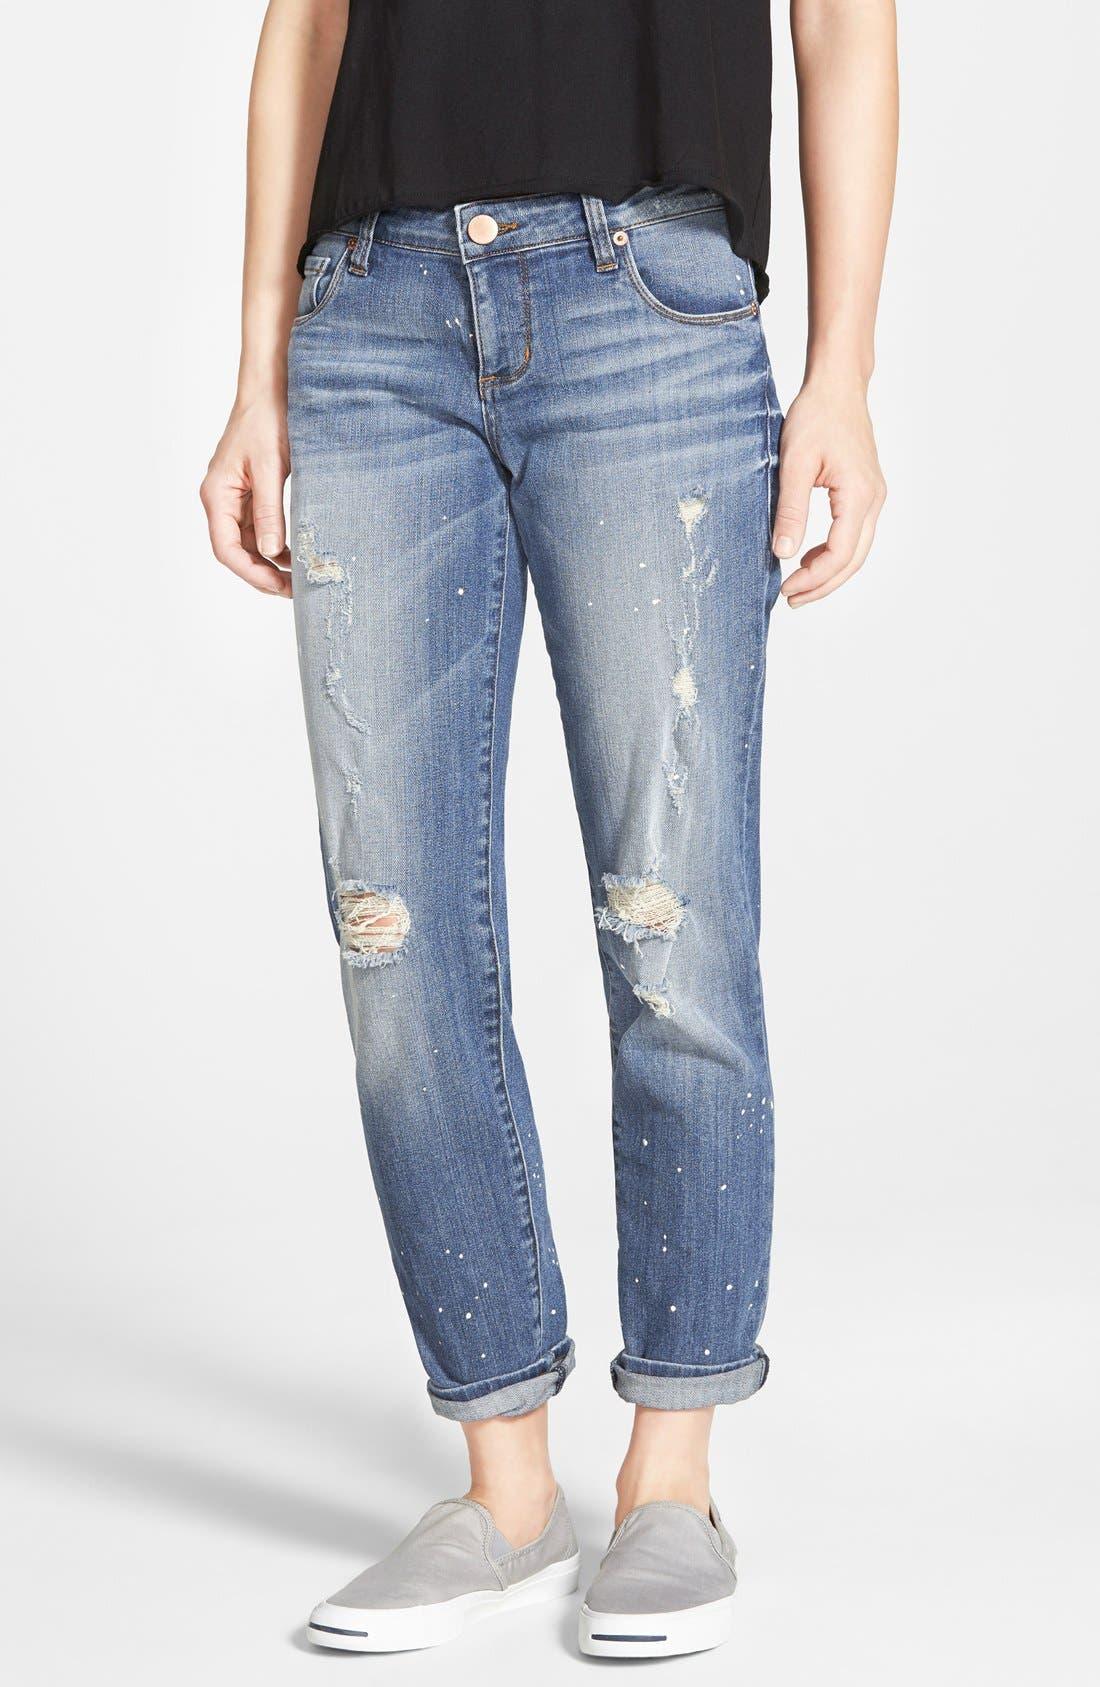 Alternate Image 1 Selected - STS Blue 'Joey' Distressed Splatter Boyfriend Jeans